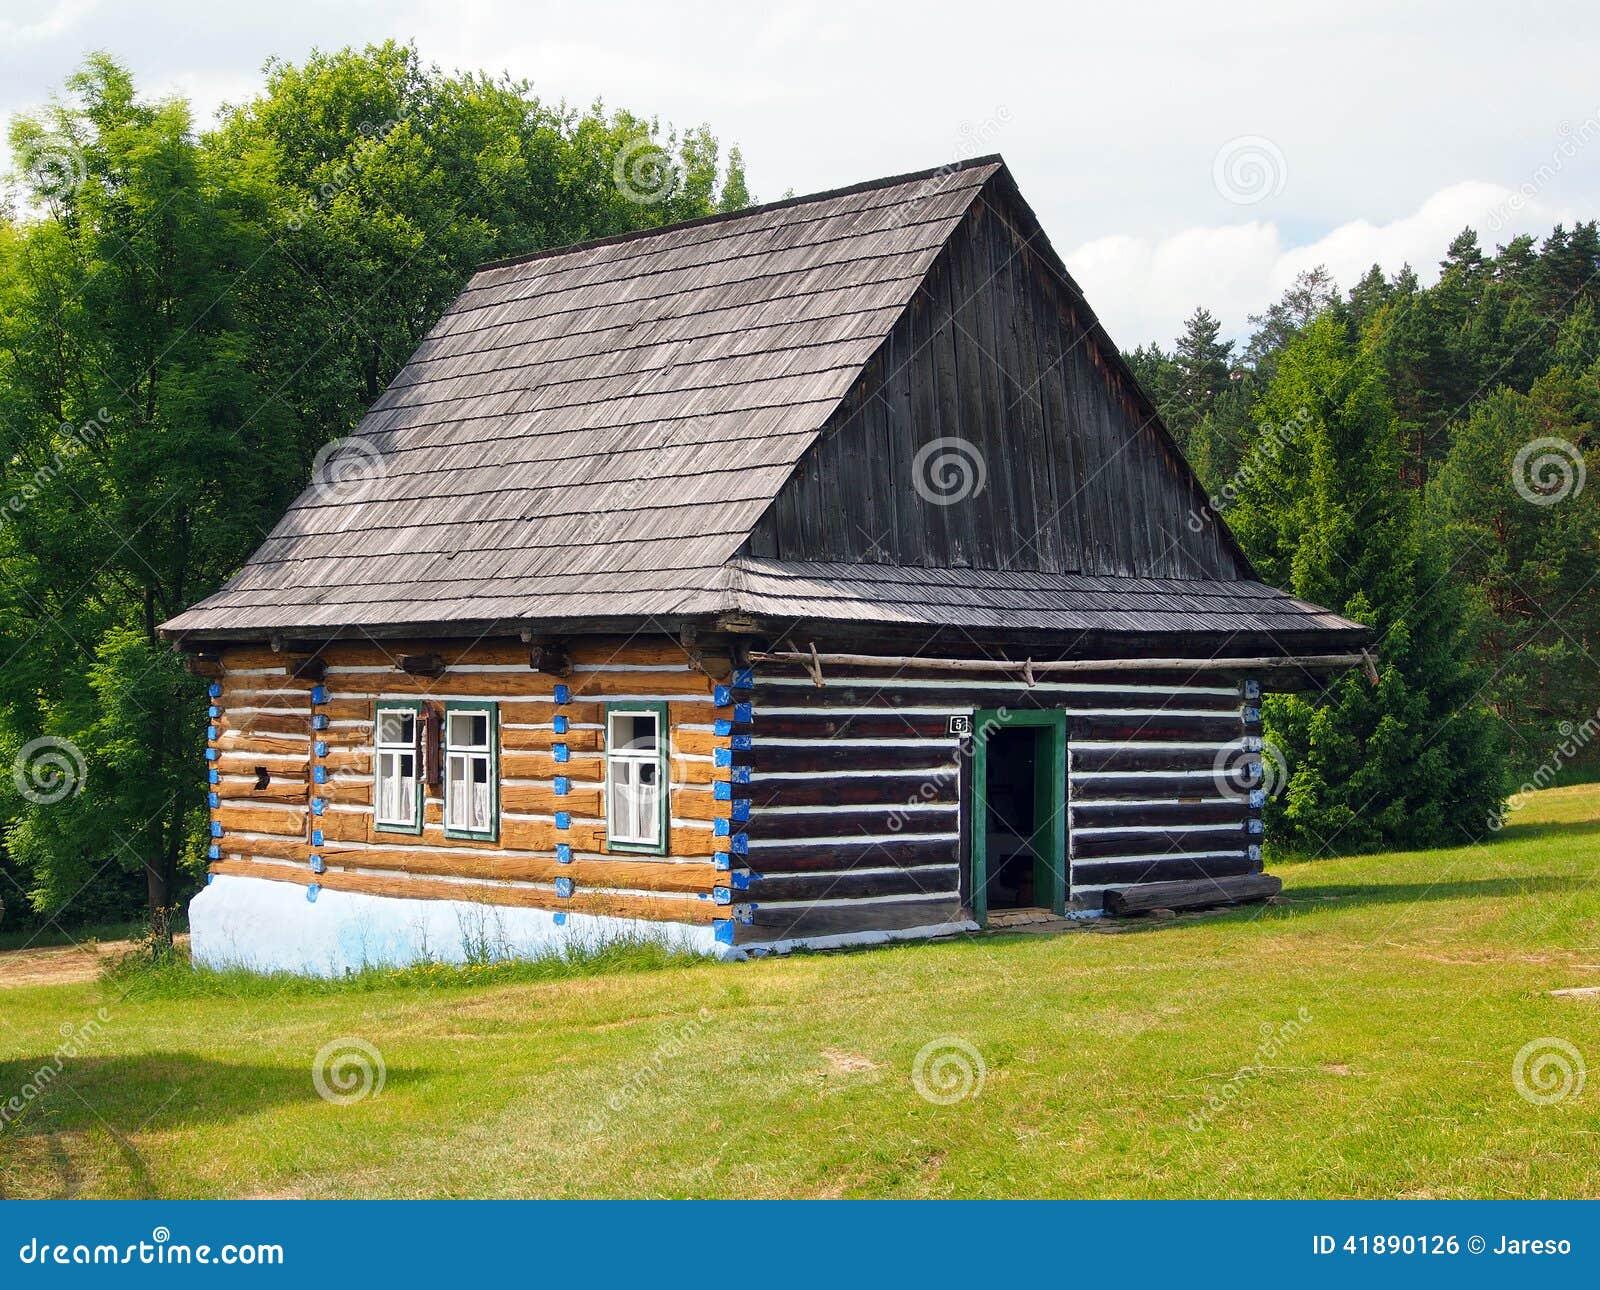 An authentic folk house in Stara Lubovna